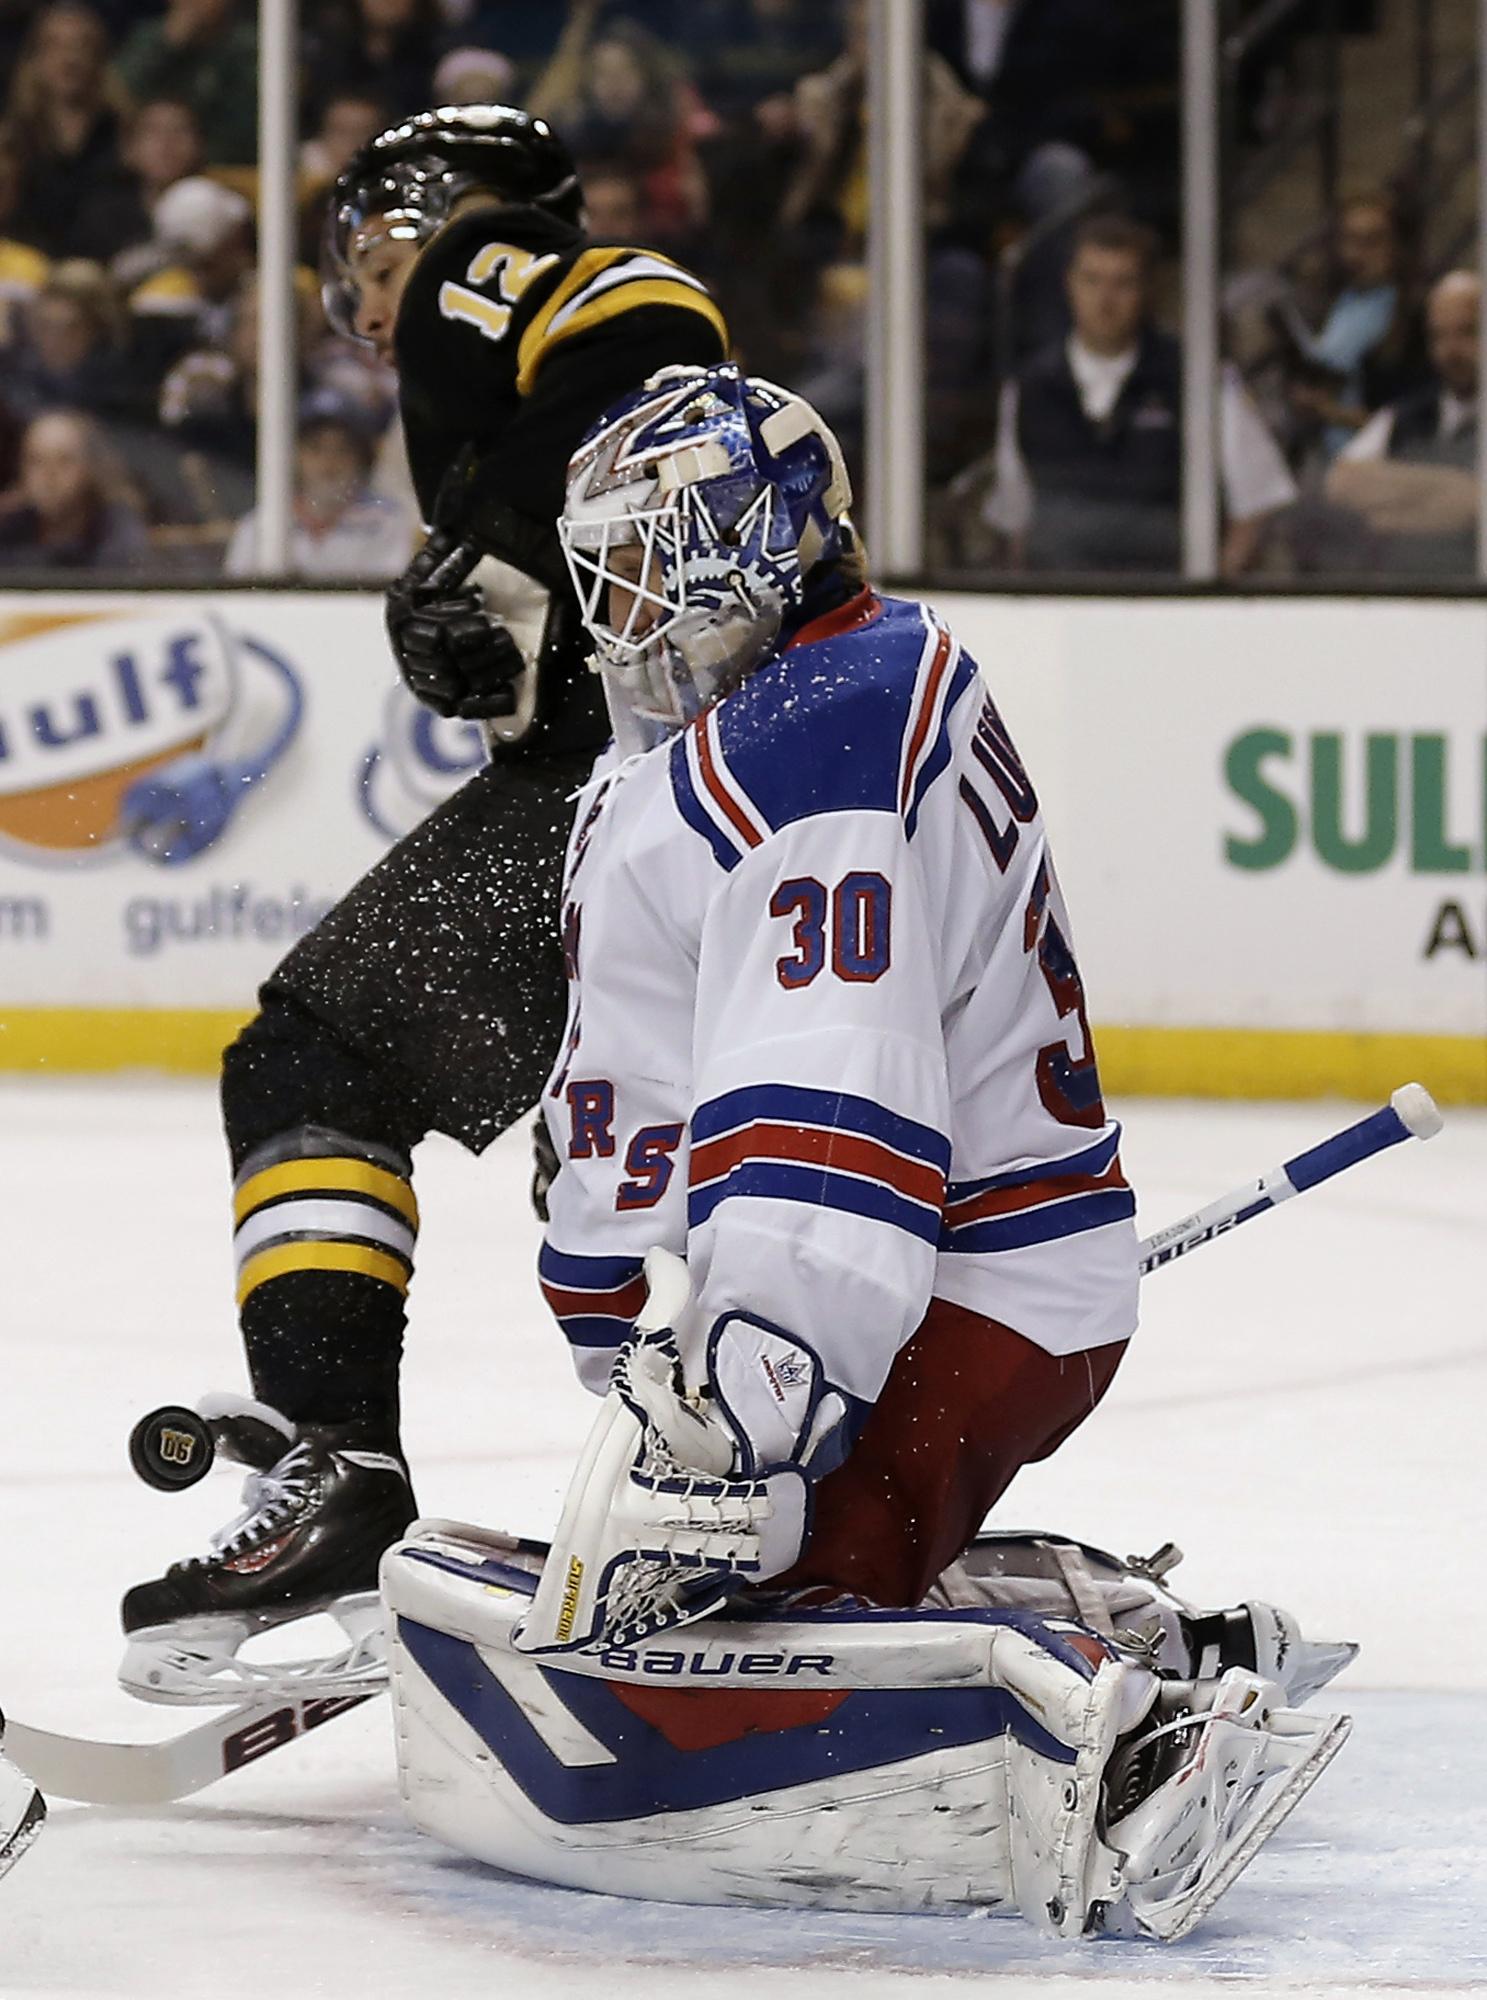 Rangers' Lundqvist gets $59.5 million extension